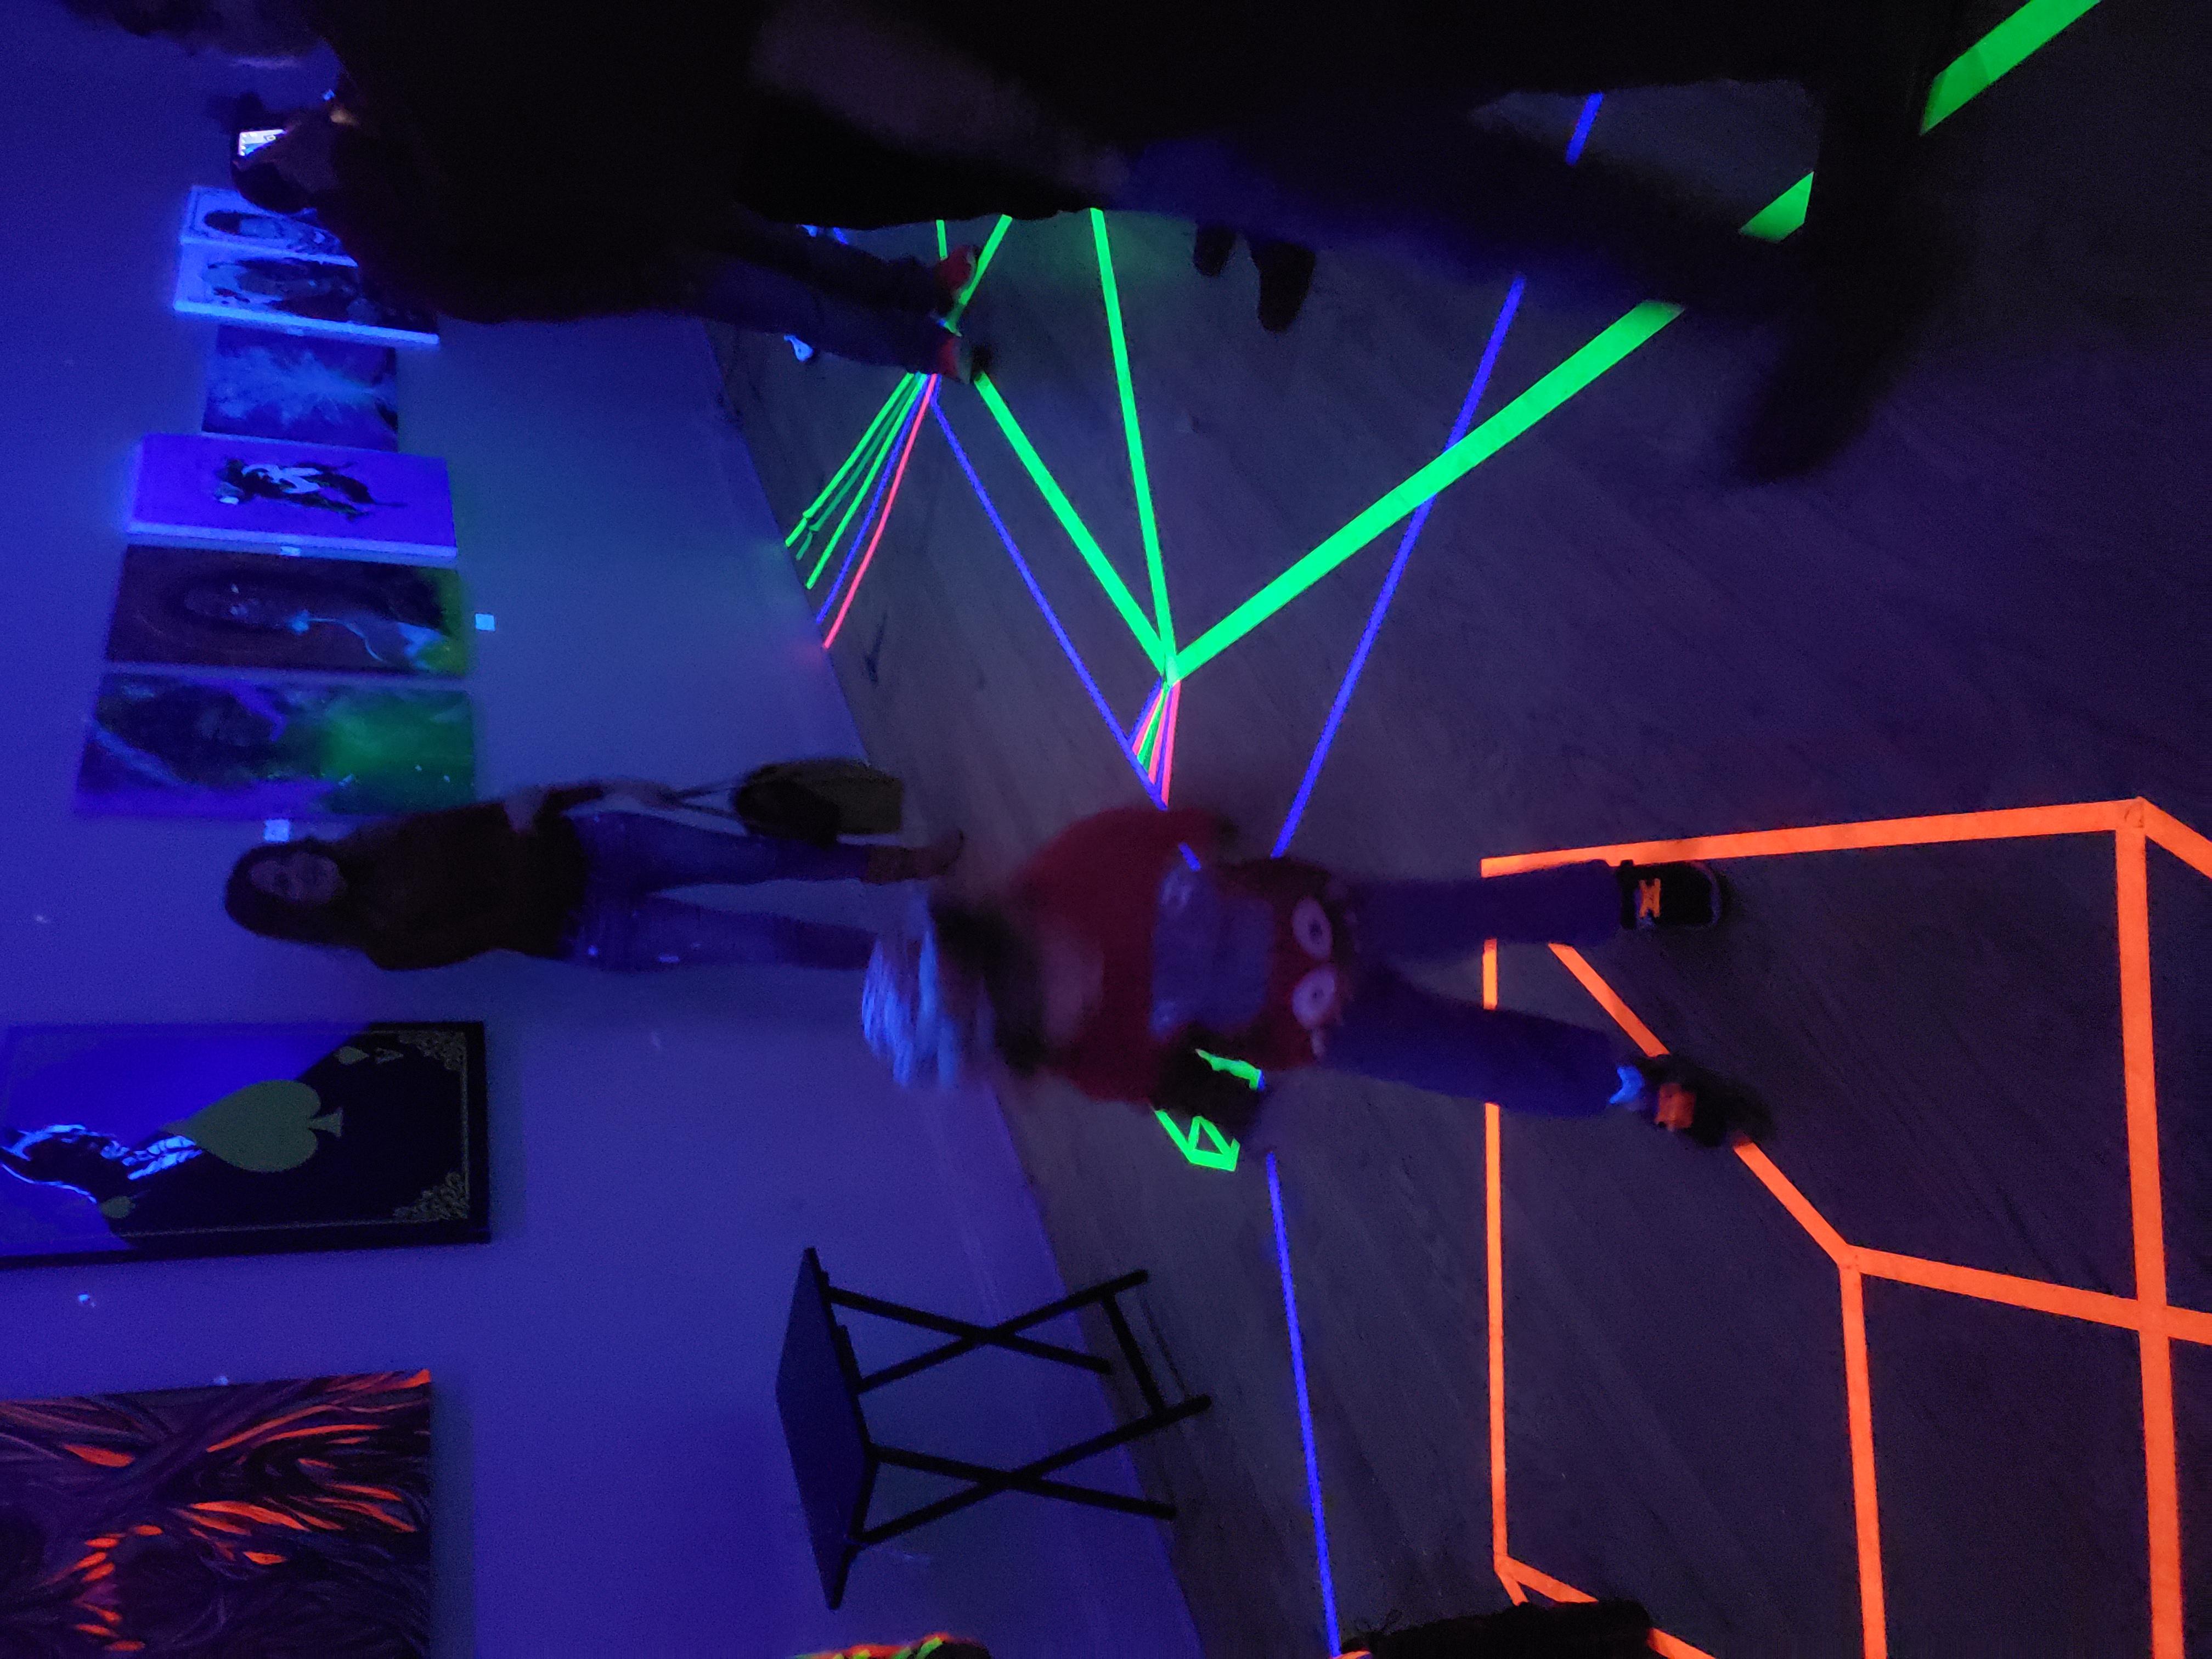 Neon show 4